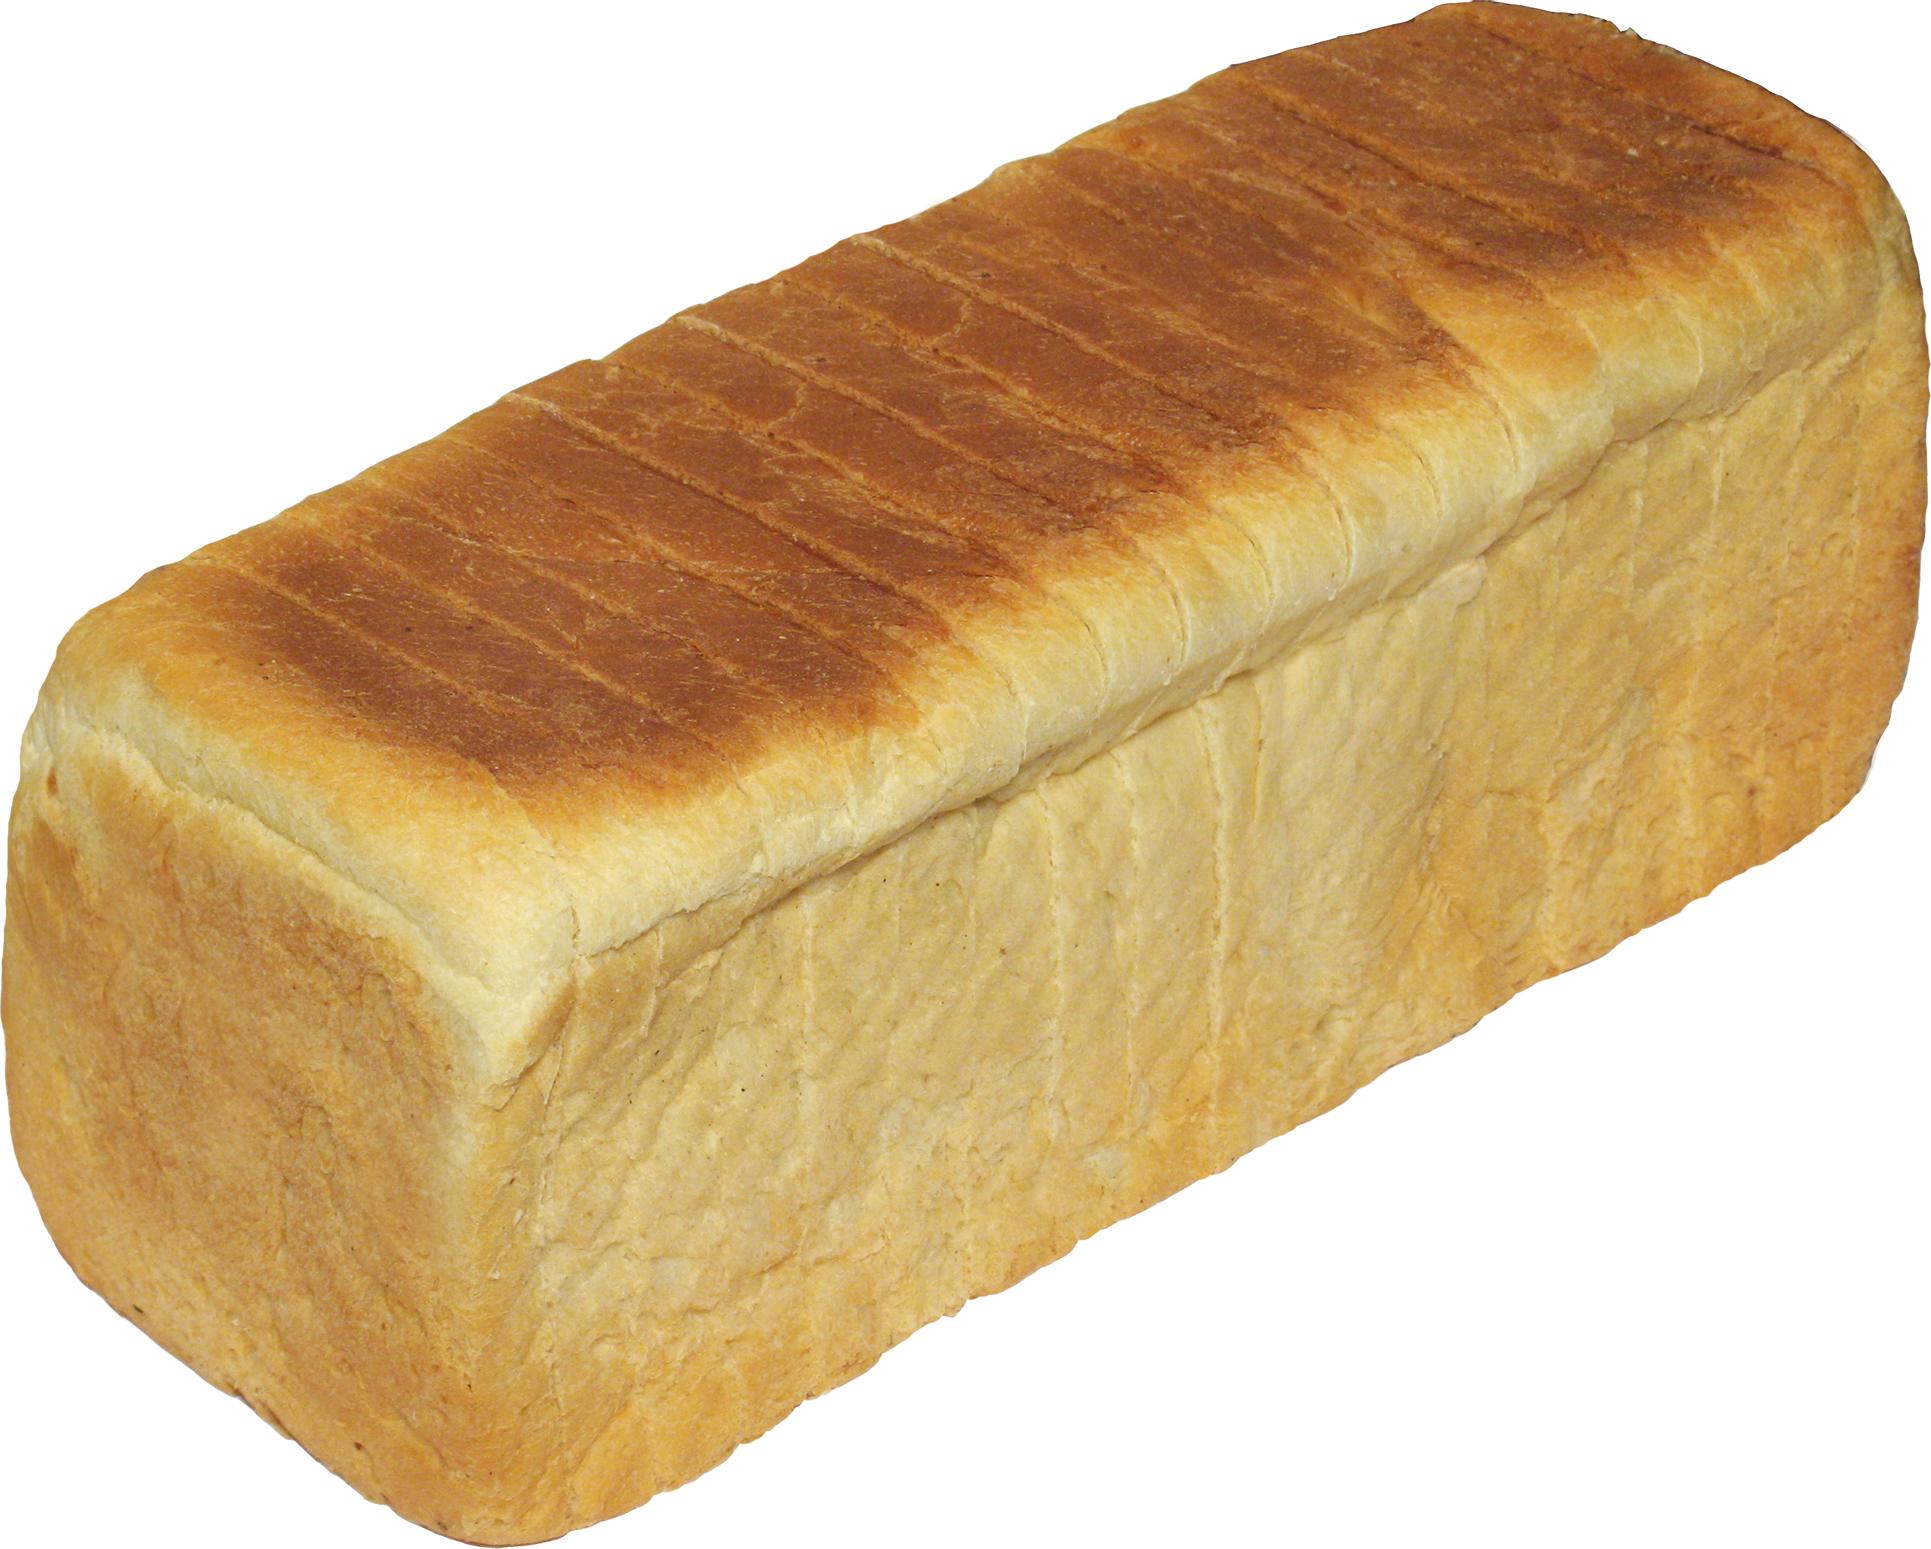 Transparent png file web. Clipart fish bread